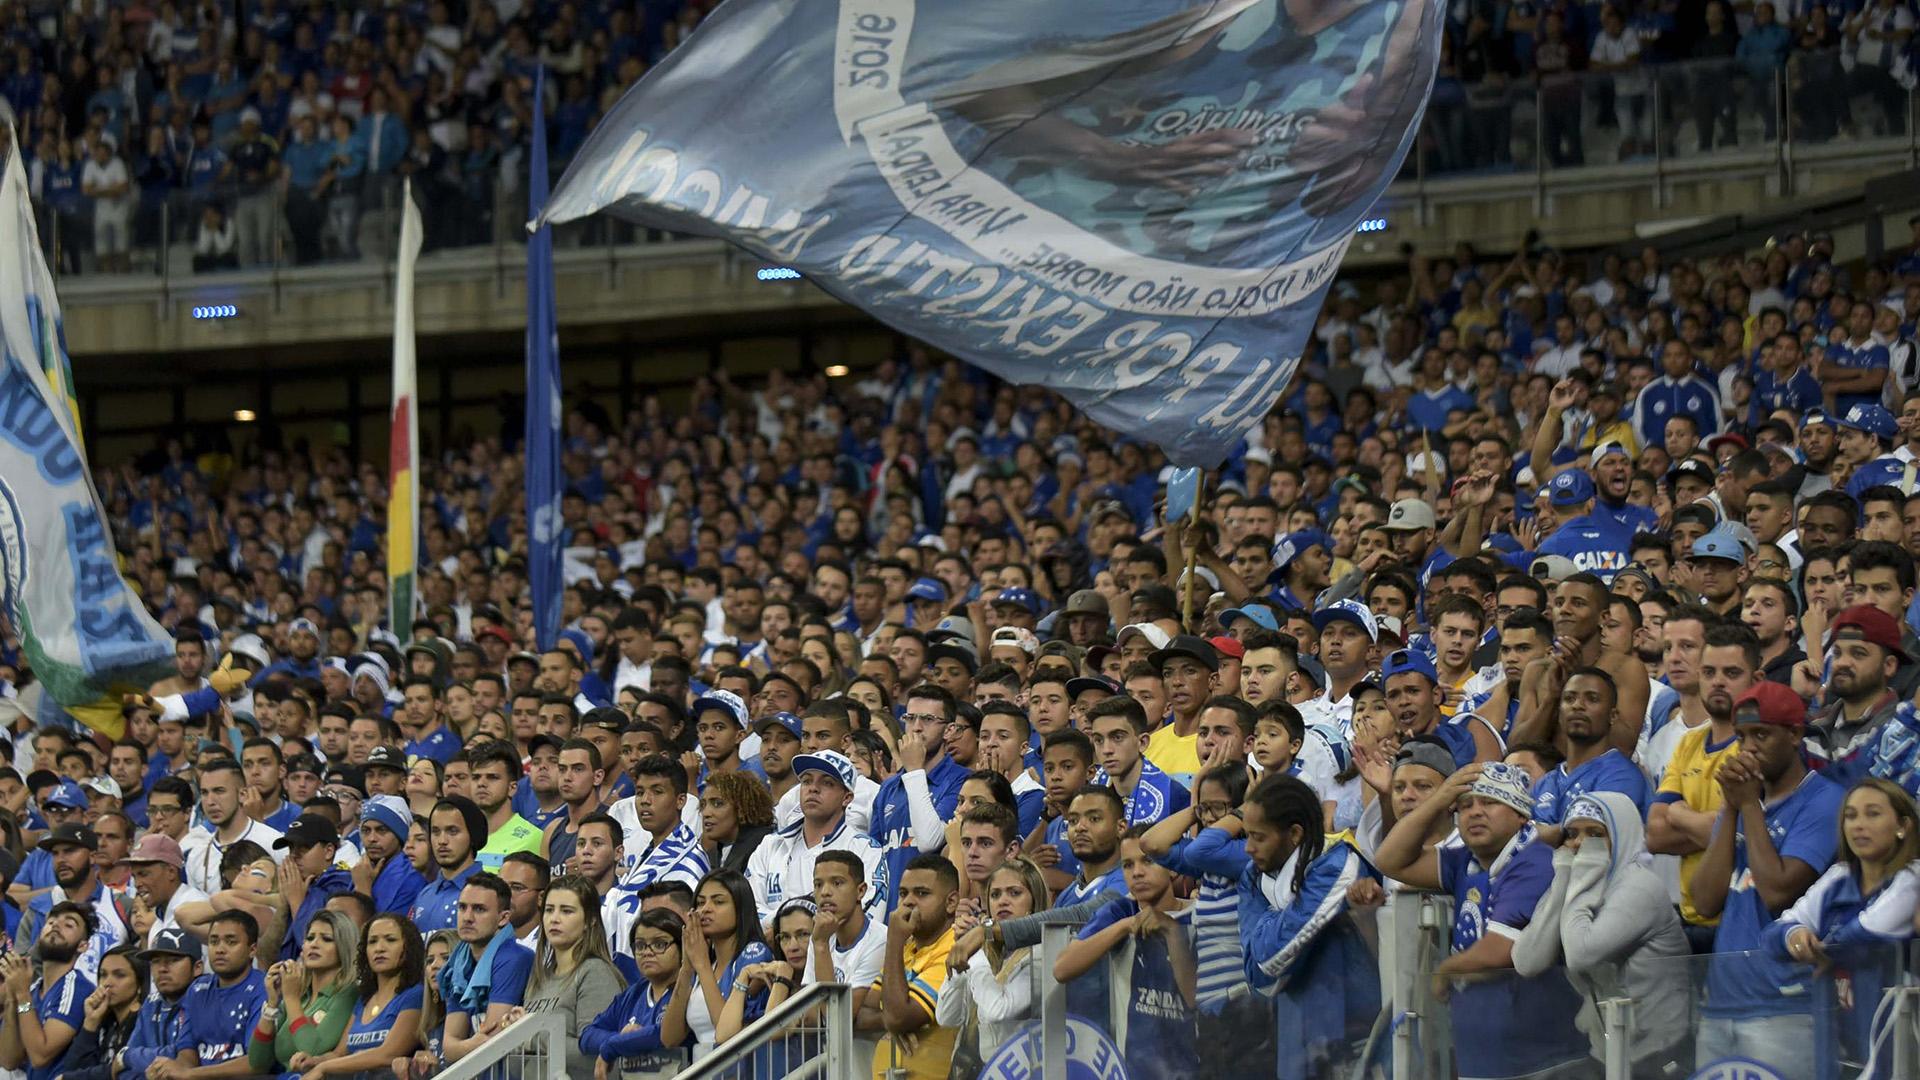 Torcida Cruzeiro Copa do Brasil 26072017